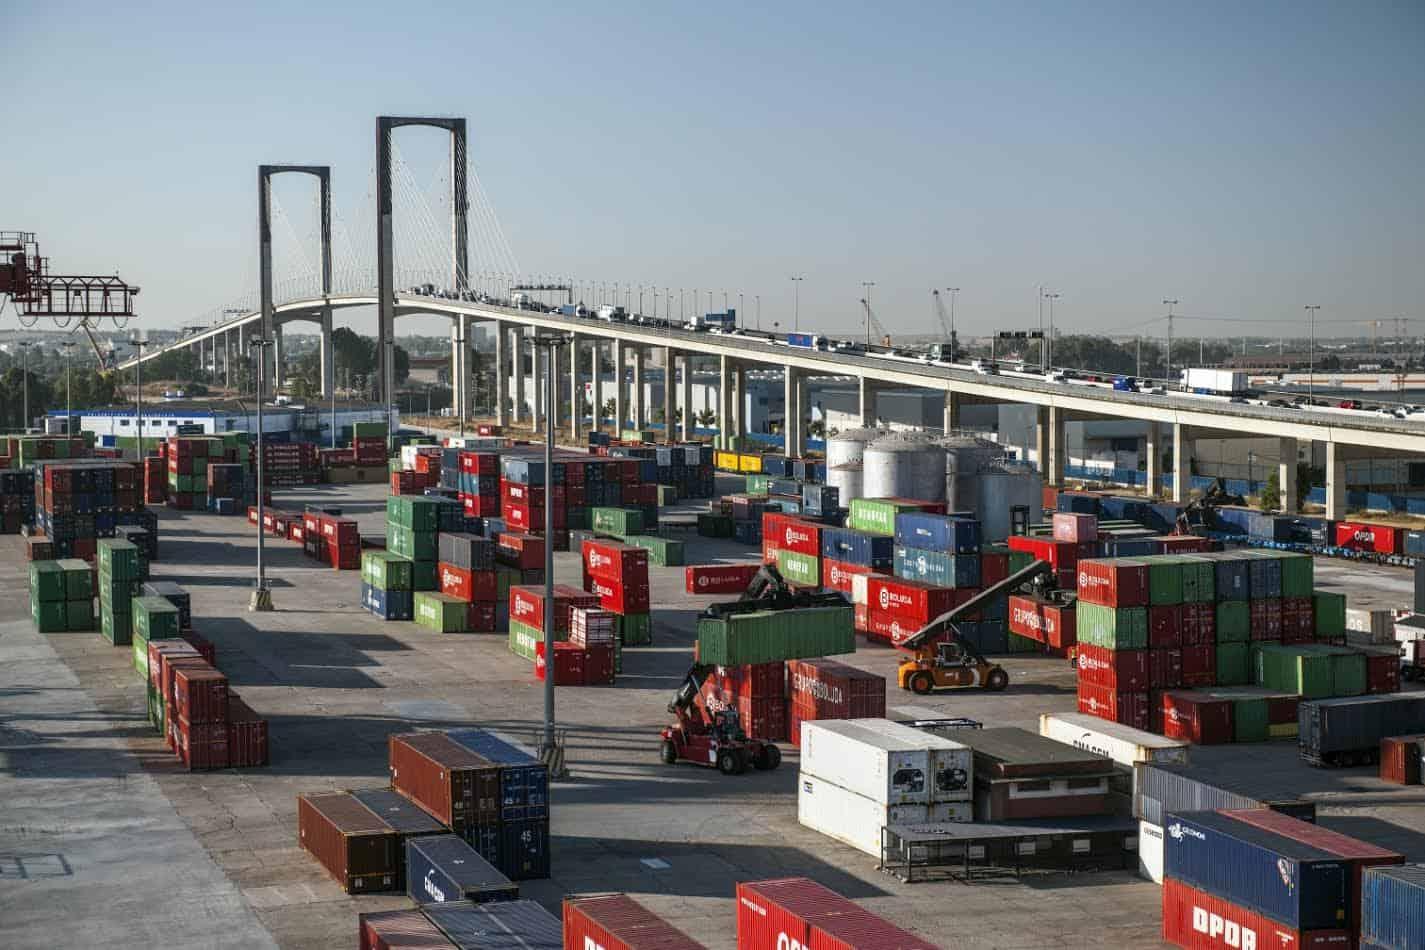 Boluda/OPDR joint venture begins operations in Seville